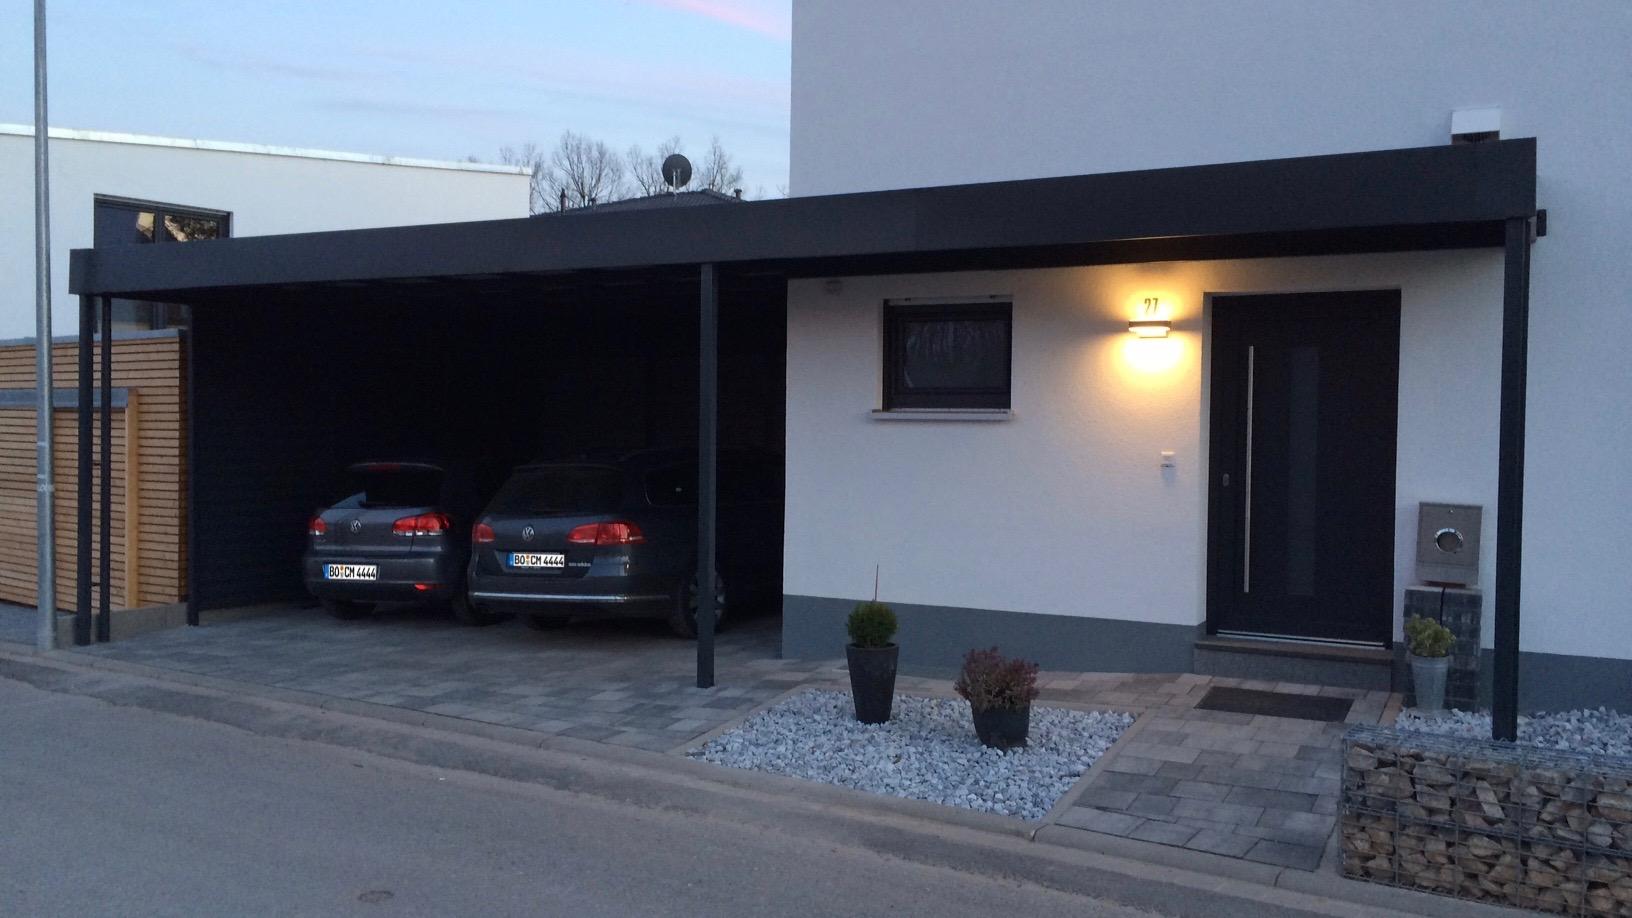 Carport mit Eingangsüberdachung - Carportmaster Projekt 15-P-1016 - 90587 Veitsbronn - Carportbild 01